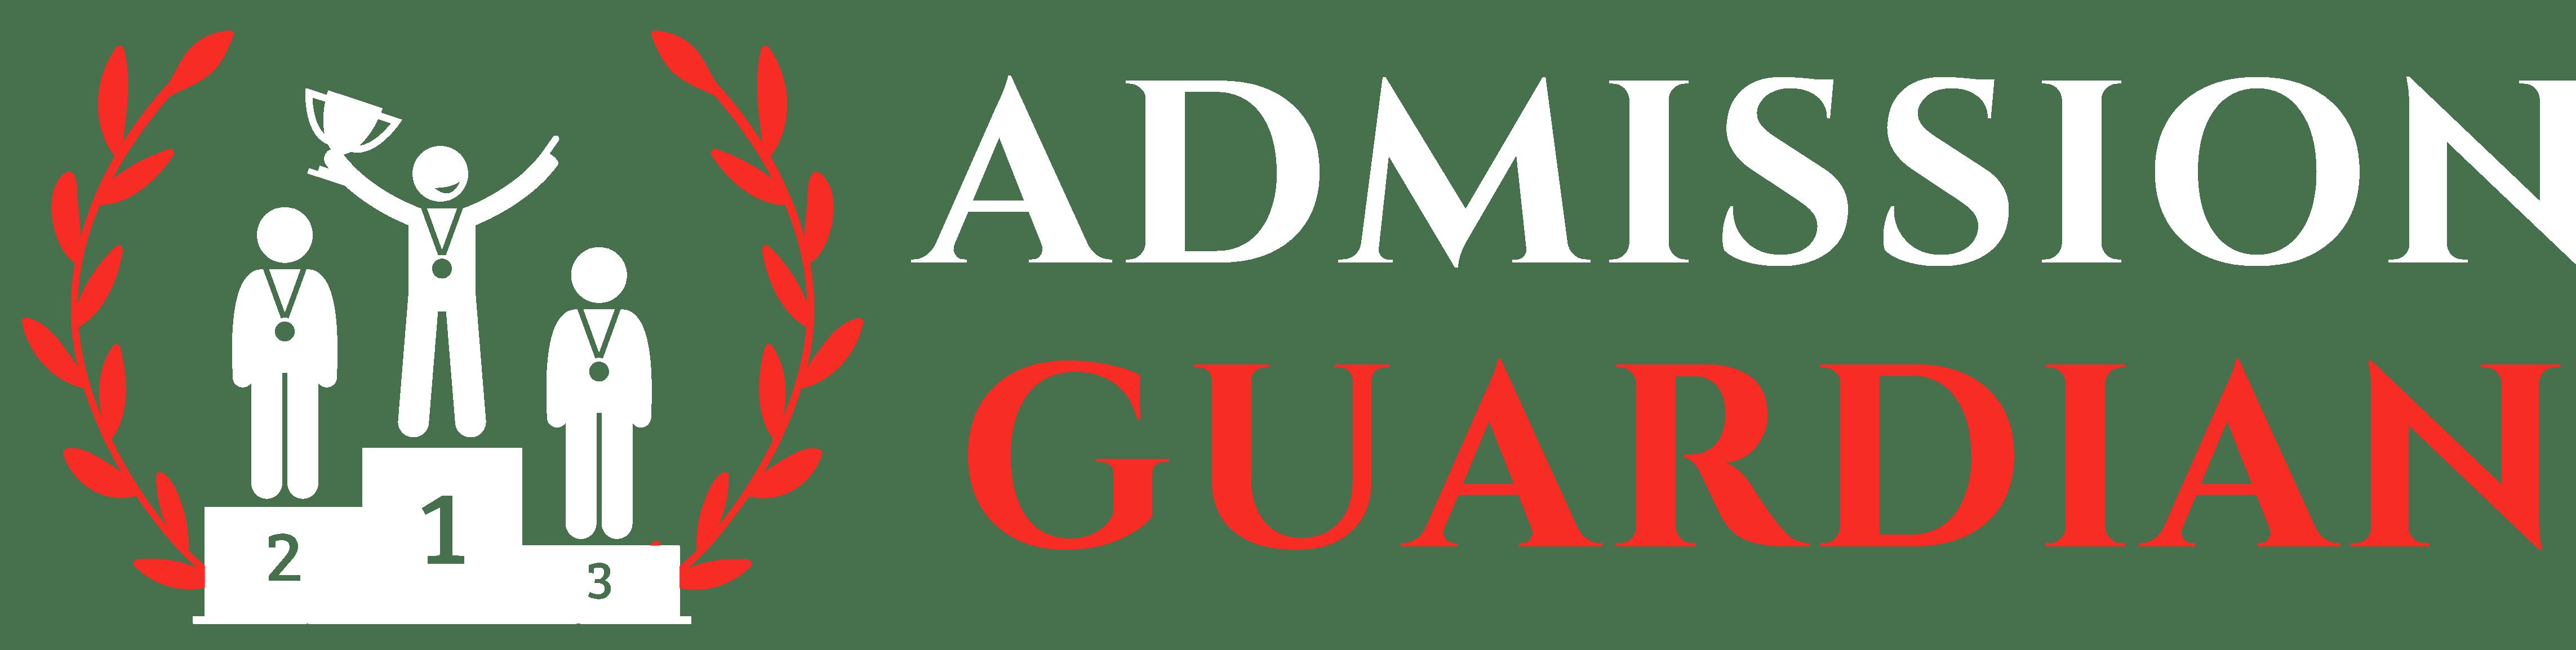 admission guardian logo